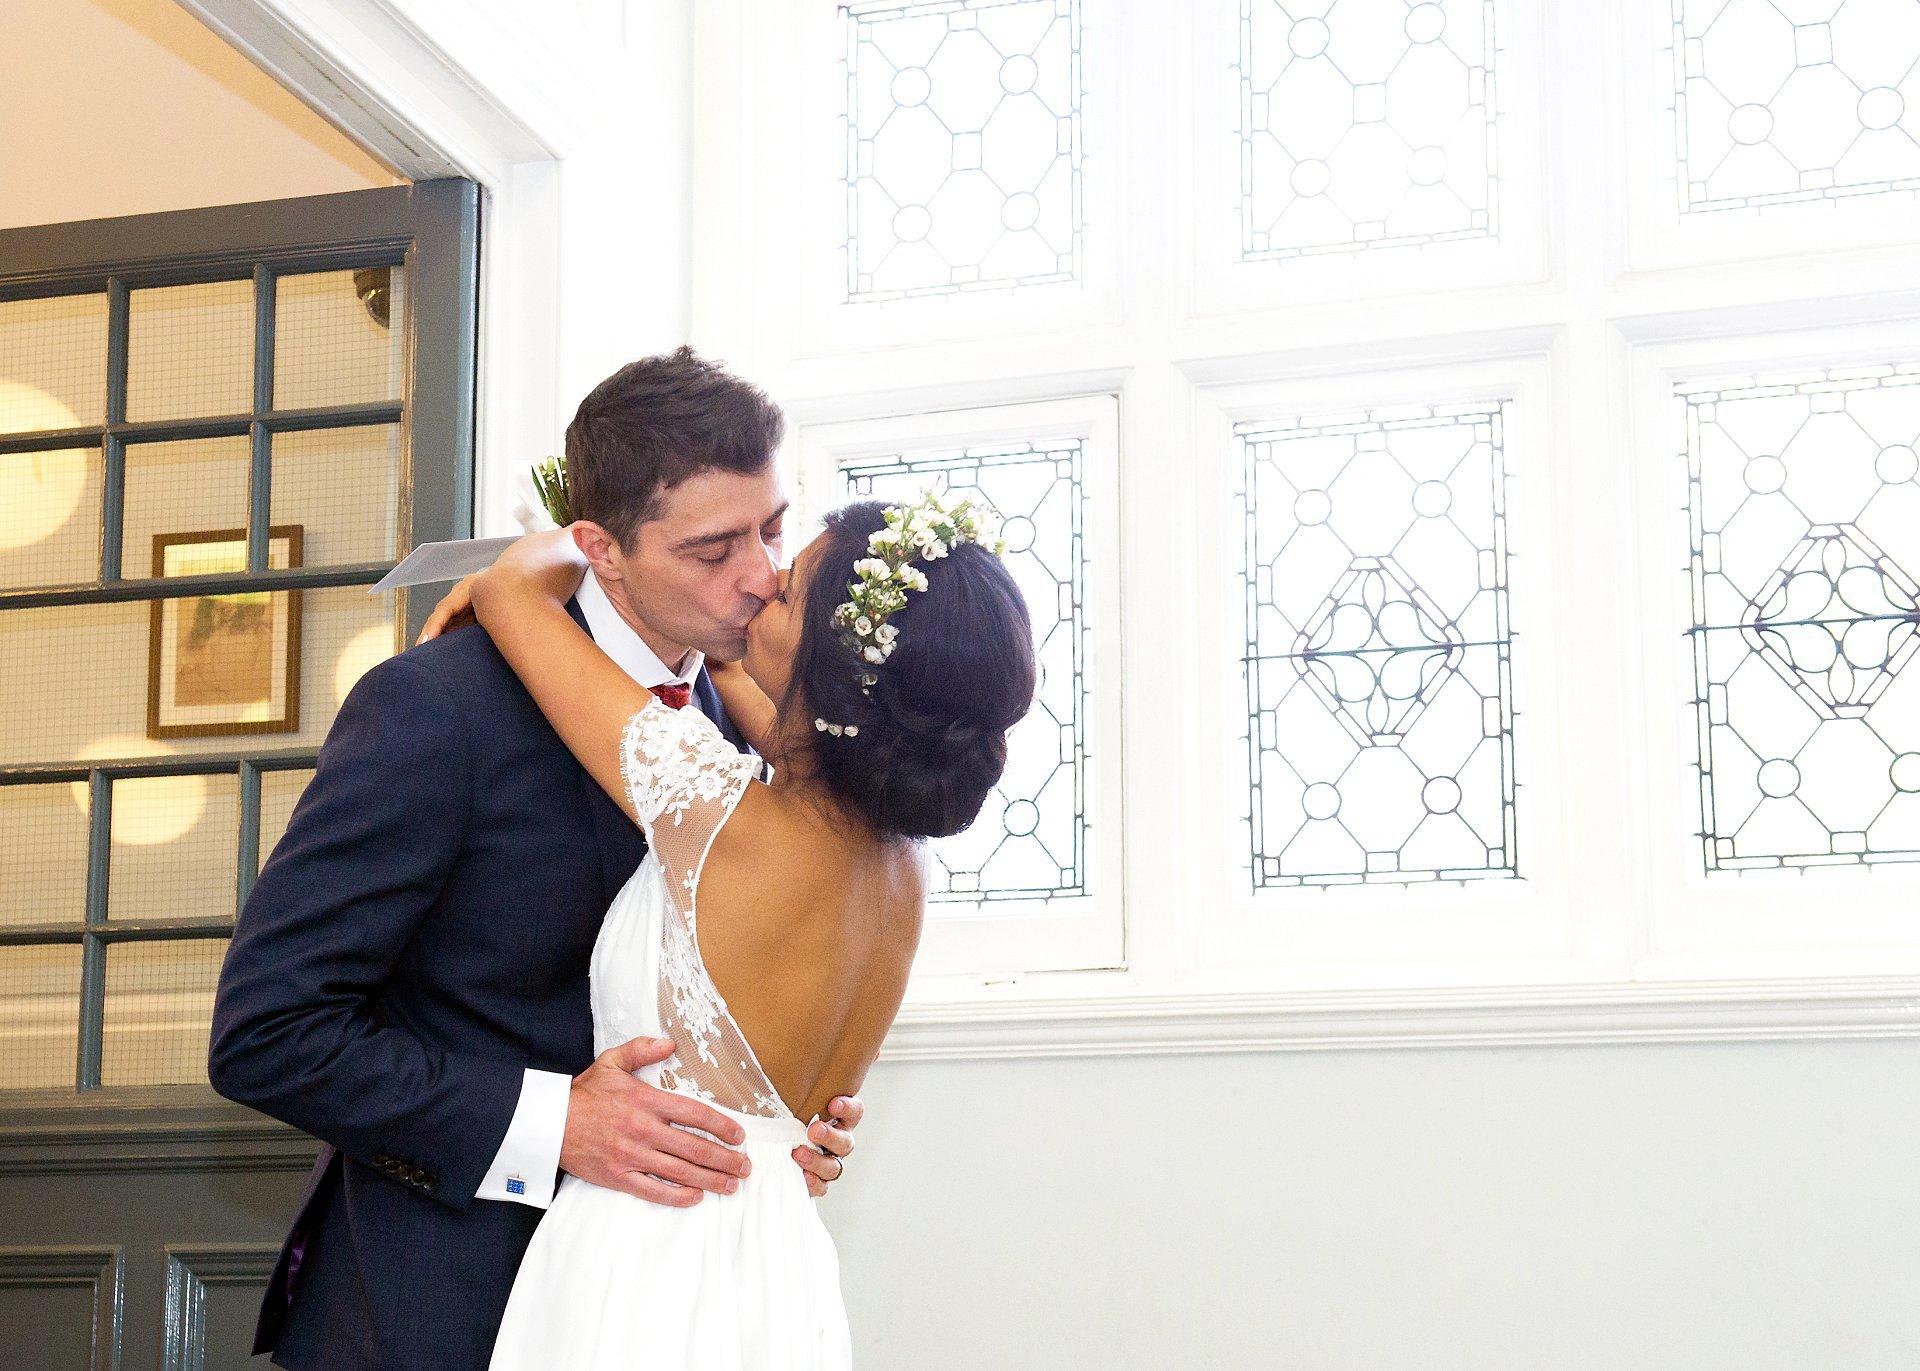 old marylebone town hall wedding photography by register office specialist photographer emma duggan